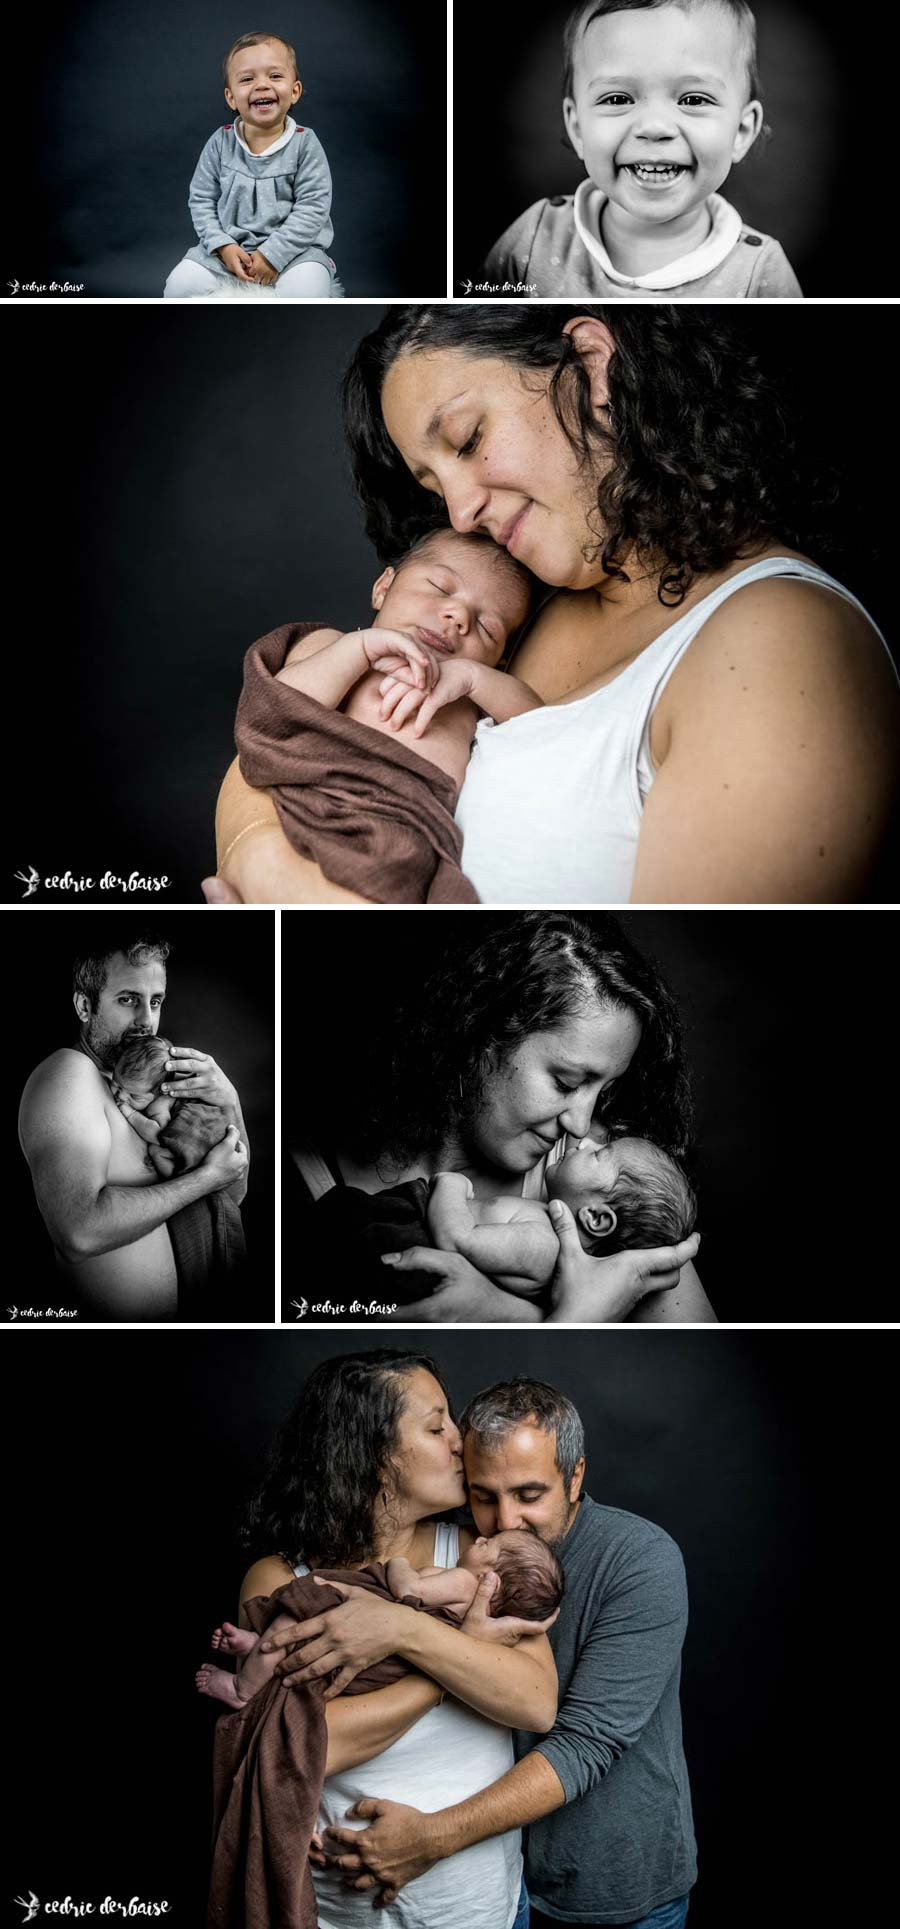 photographe oise famille et naissance